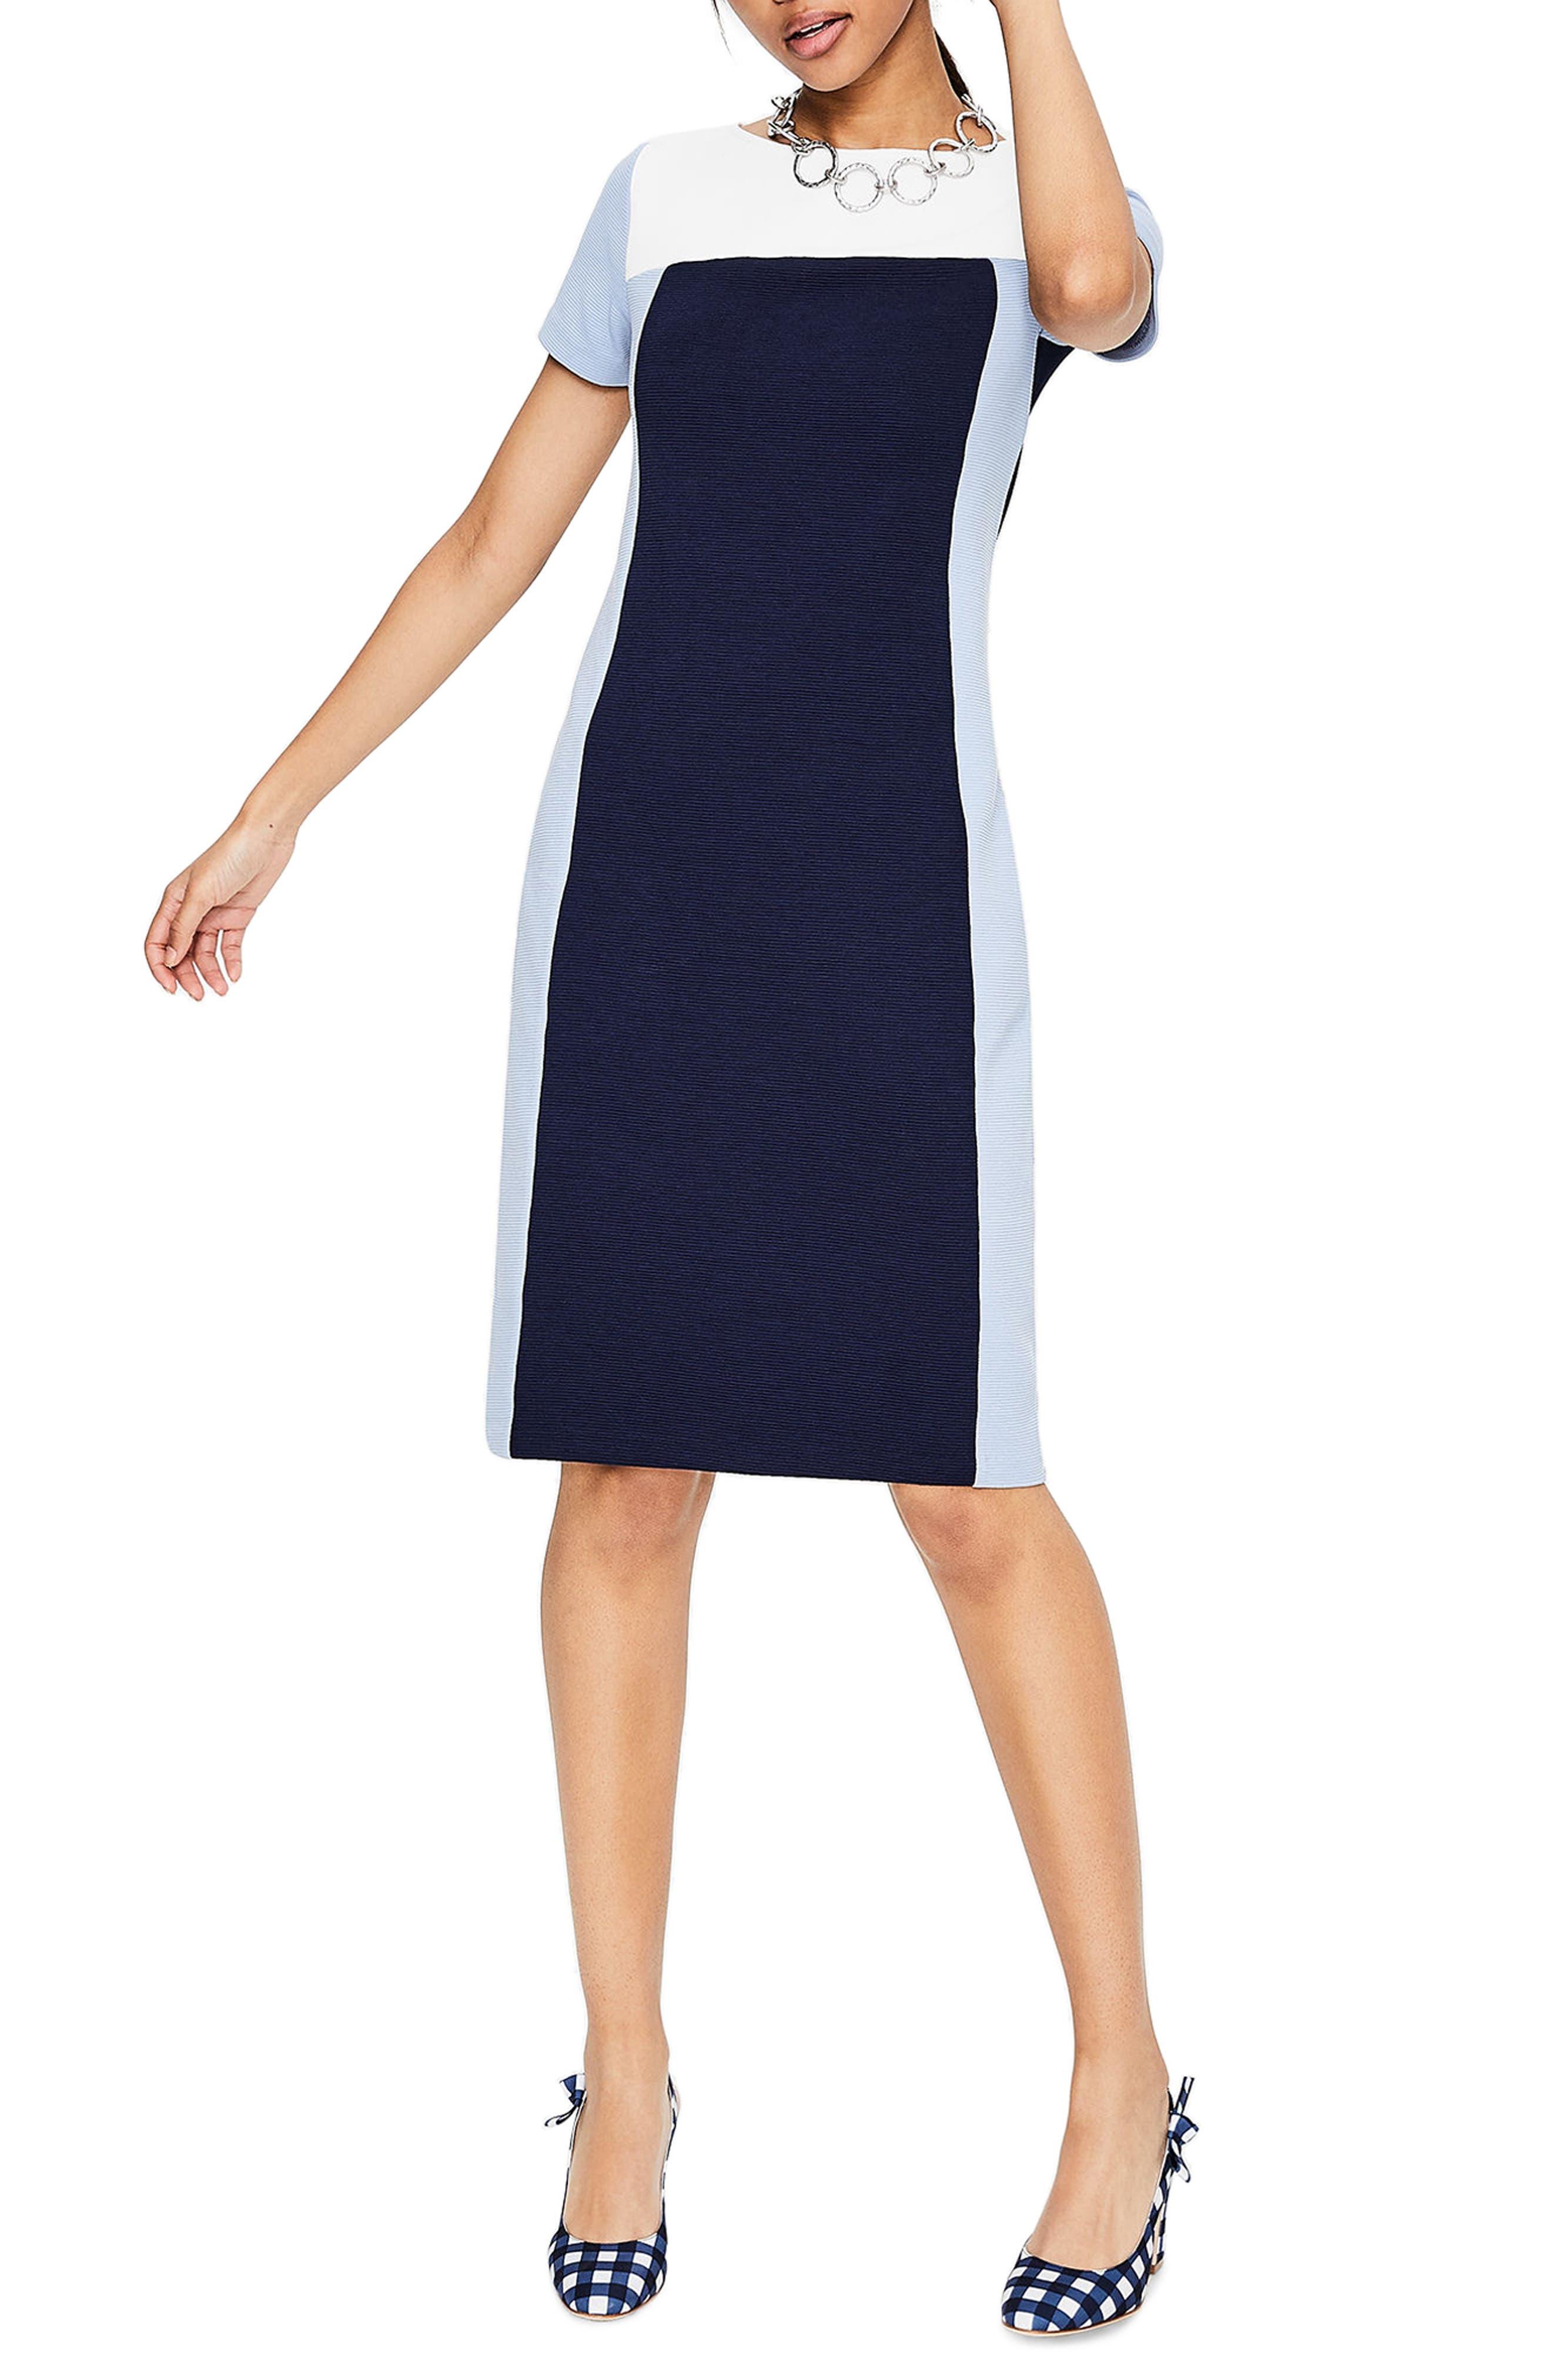 Modern Colorblock Ponte Dress,                             Main thumbnail 1, color,                             414